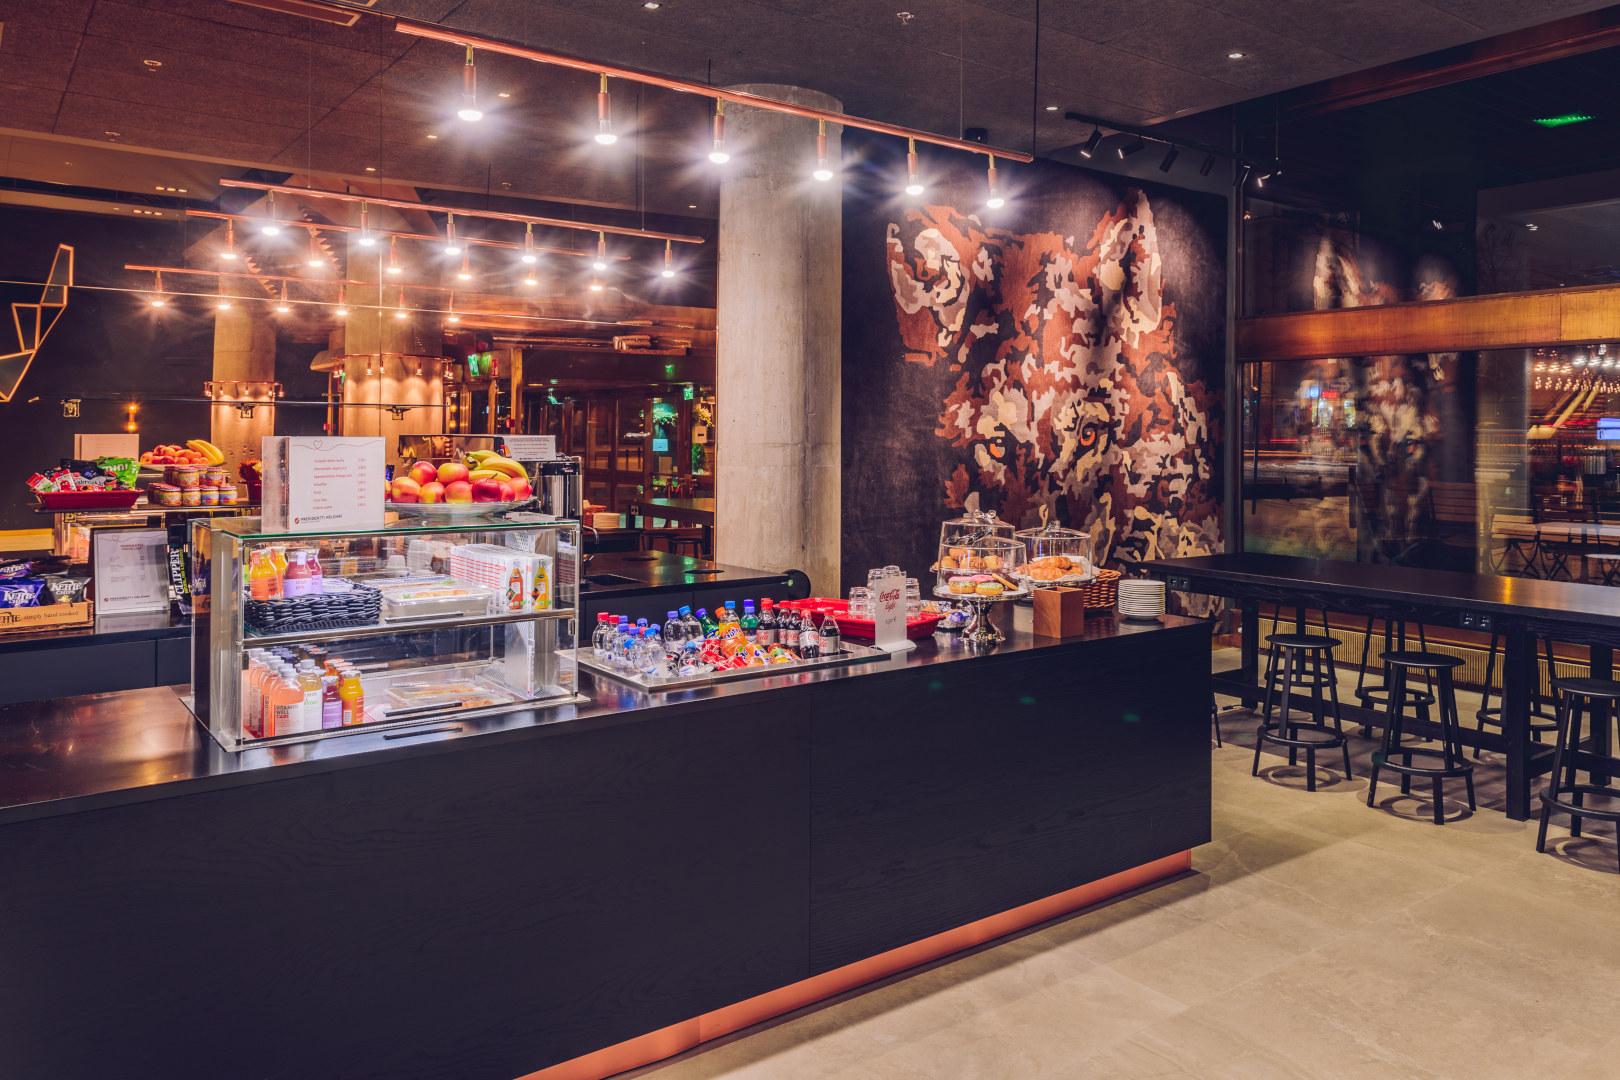 Hotel Presidentti_12_Coffee bar_Aki Rask16201